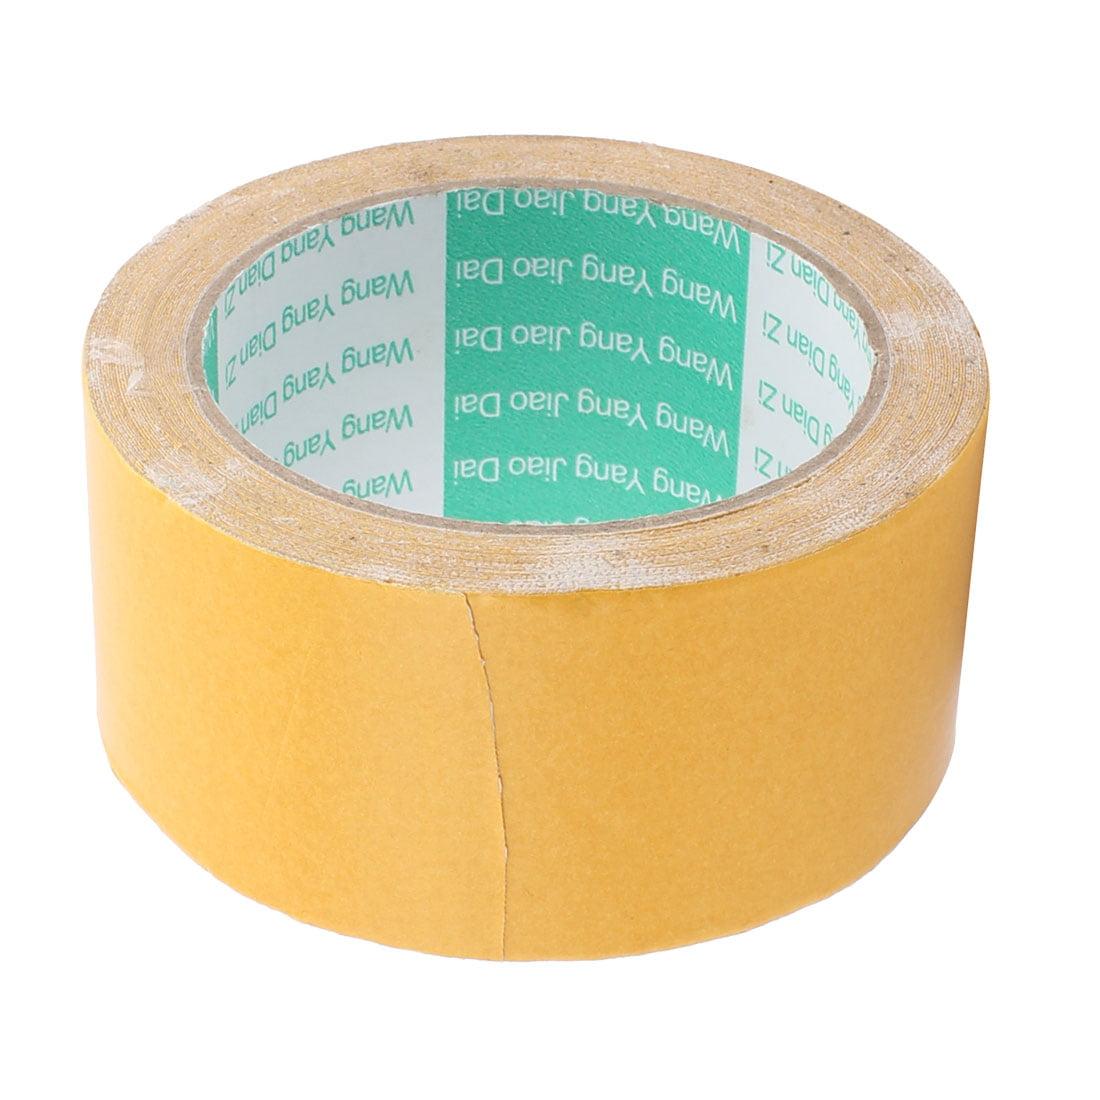 White Strong Double Sided Waterproof Sponge Tape 10 Meters Long 5cm Wide